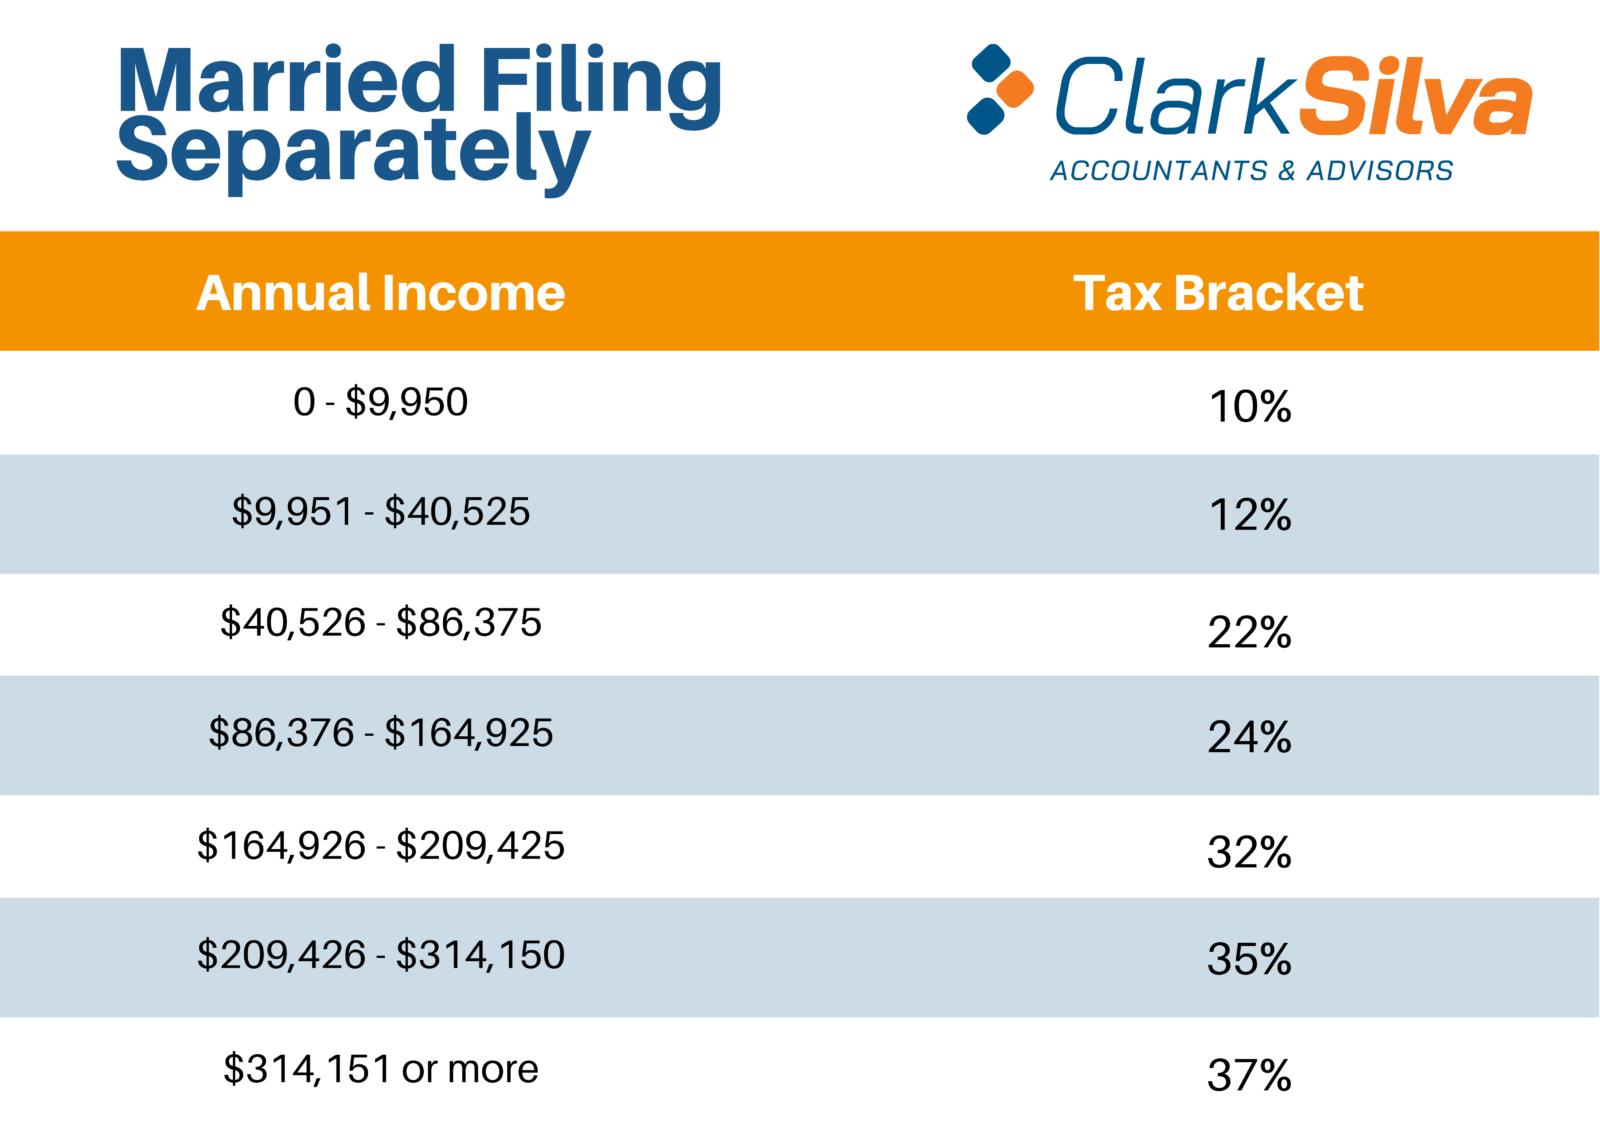 2021 Tax Bracket - Married Filing Separately